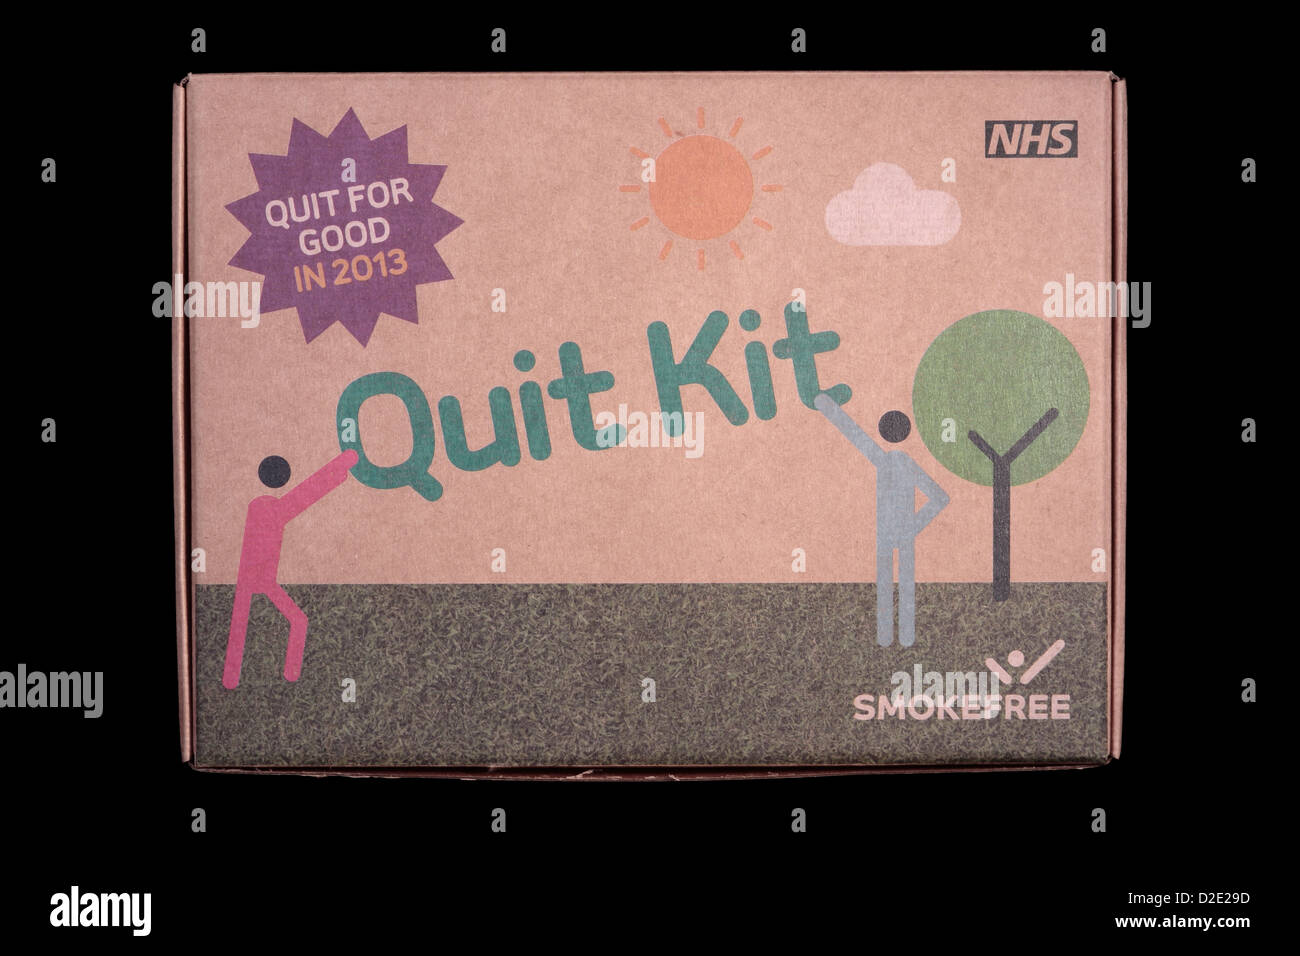 NHS Quit Kit isolated on black background - Stock Image